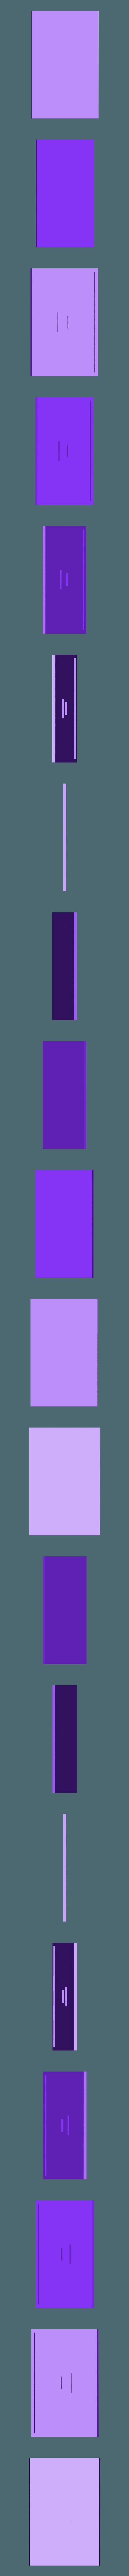 base.stl Download free STL file Magnet Thermal Picture Frame • 3D print model, fotorius